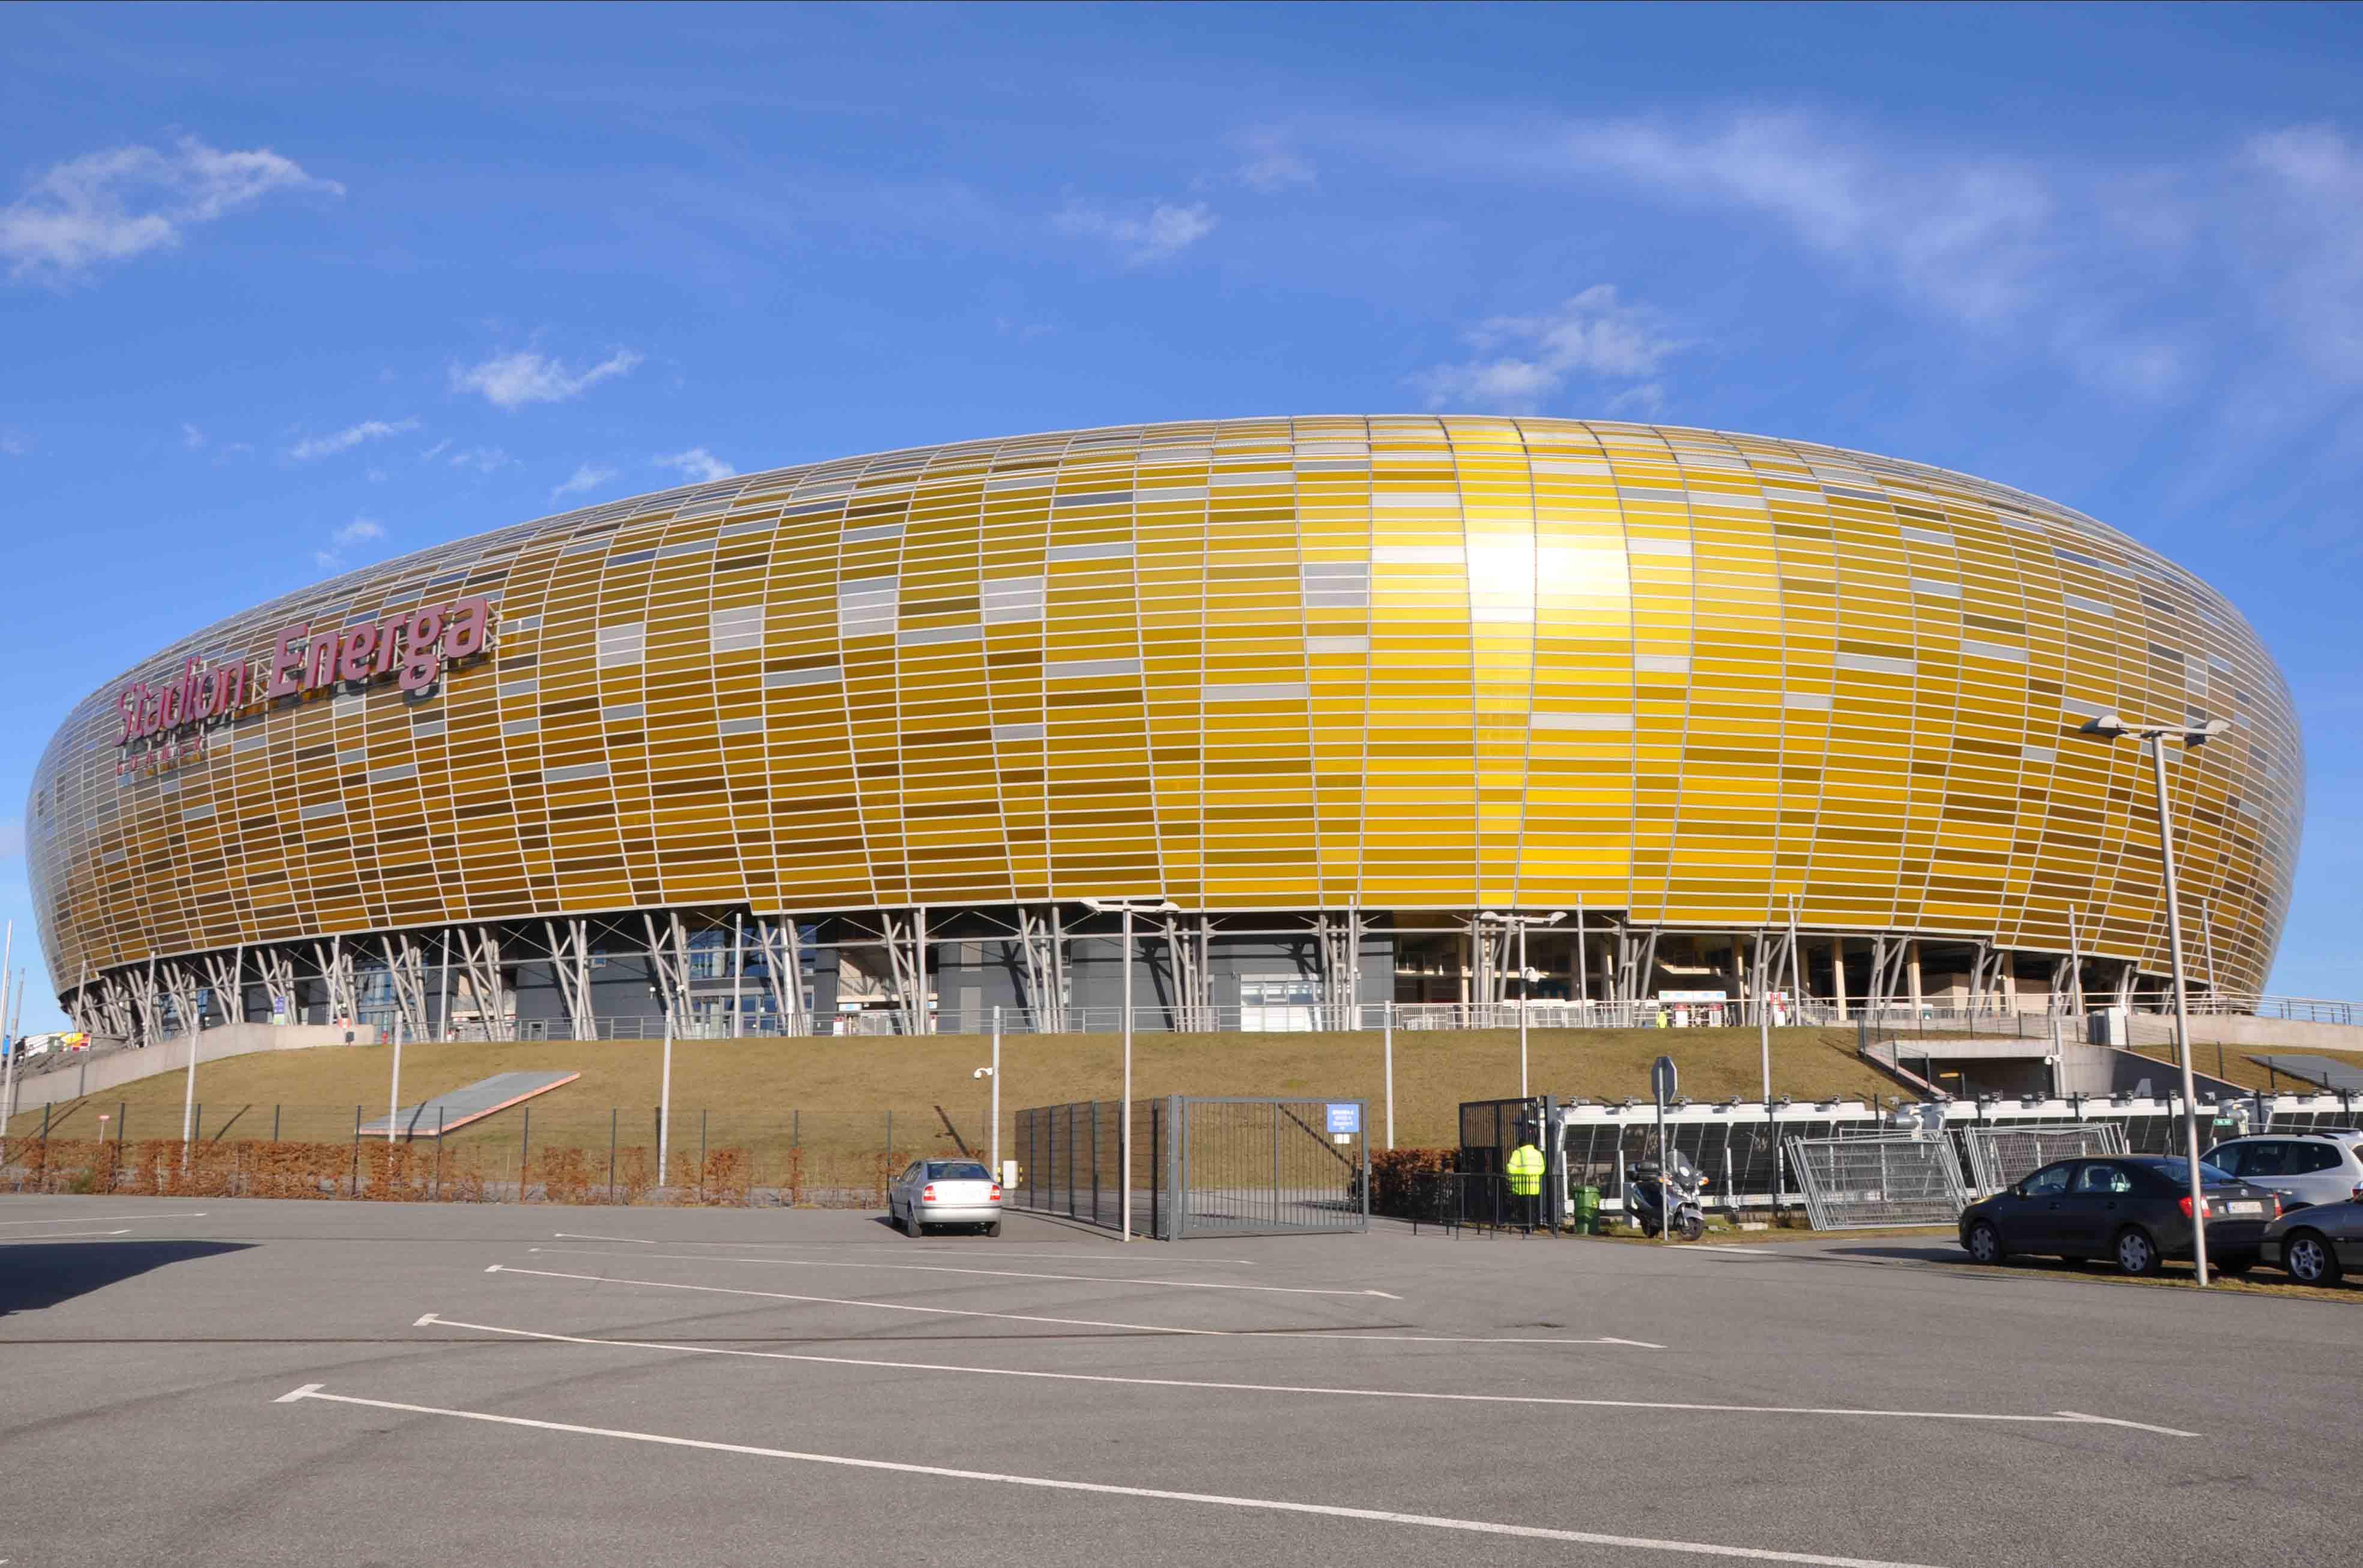 Stadium in Gdansk